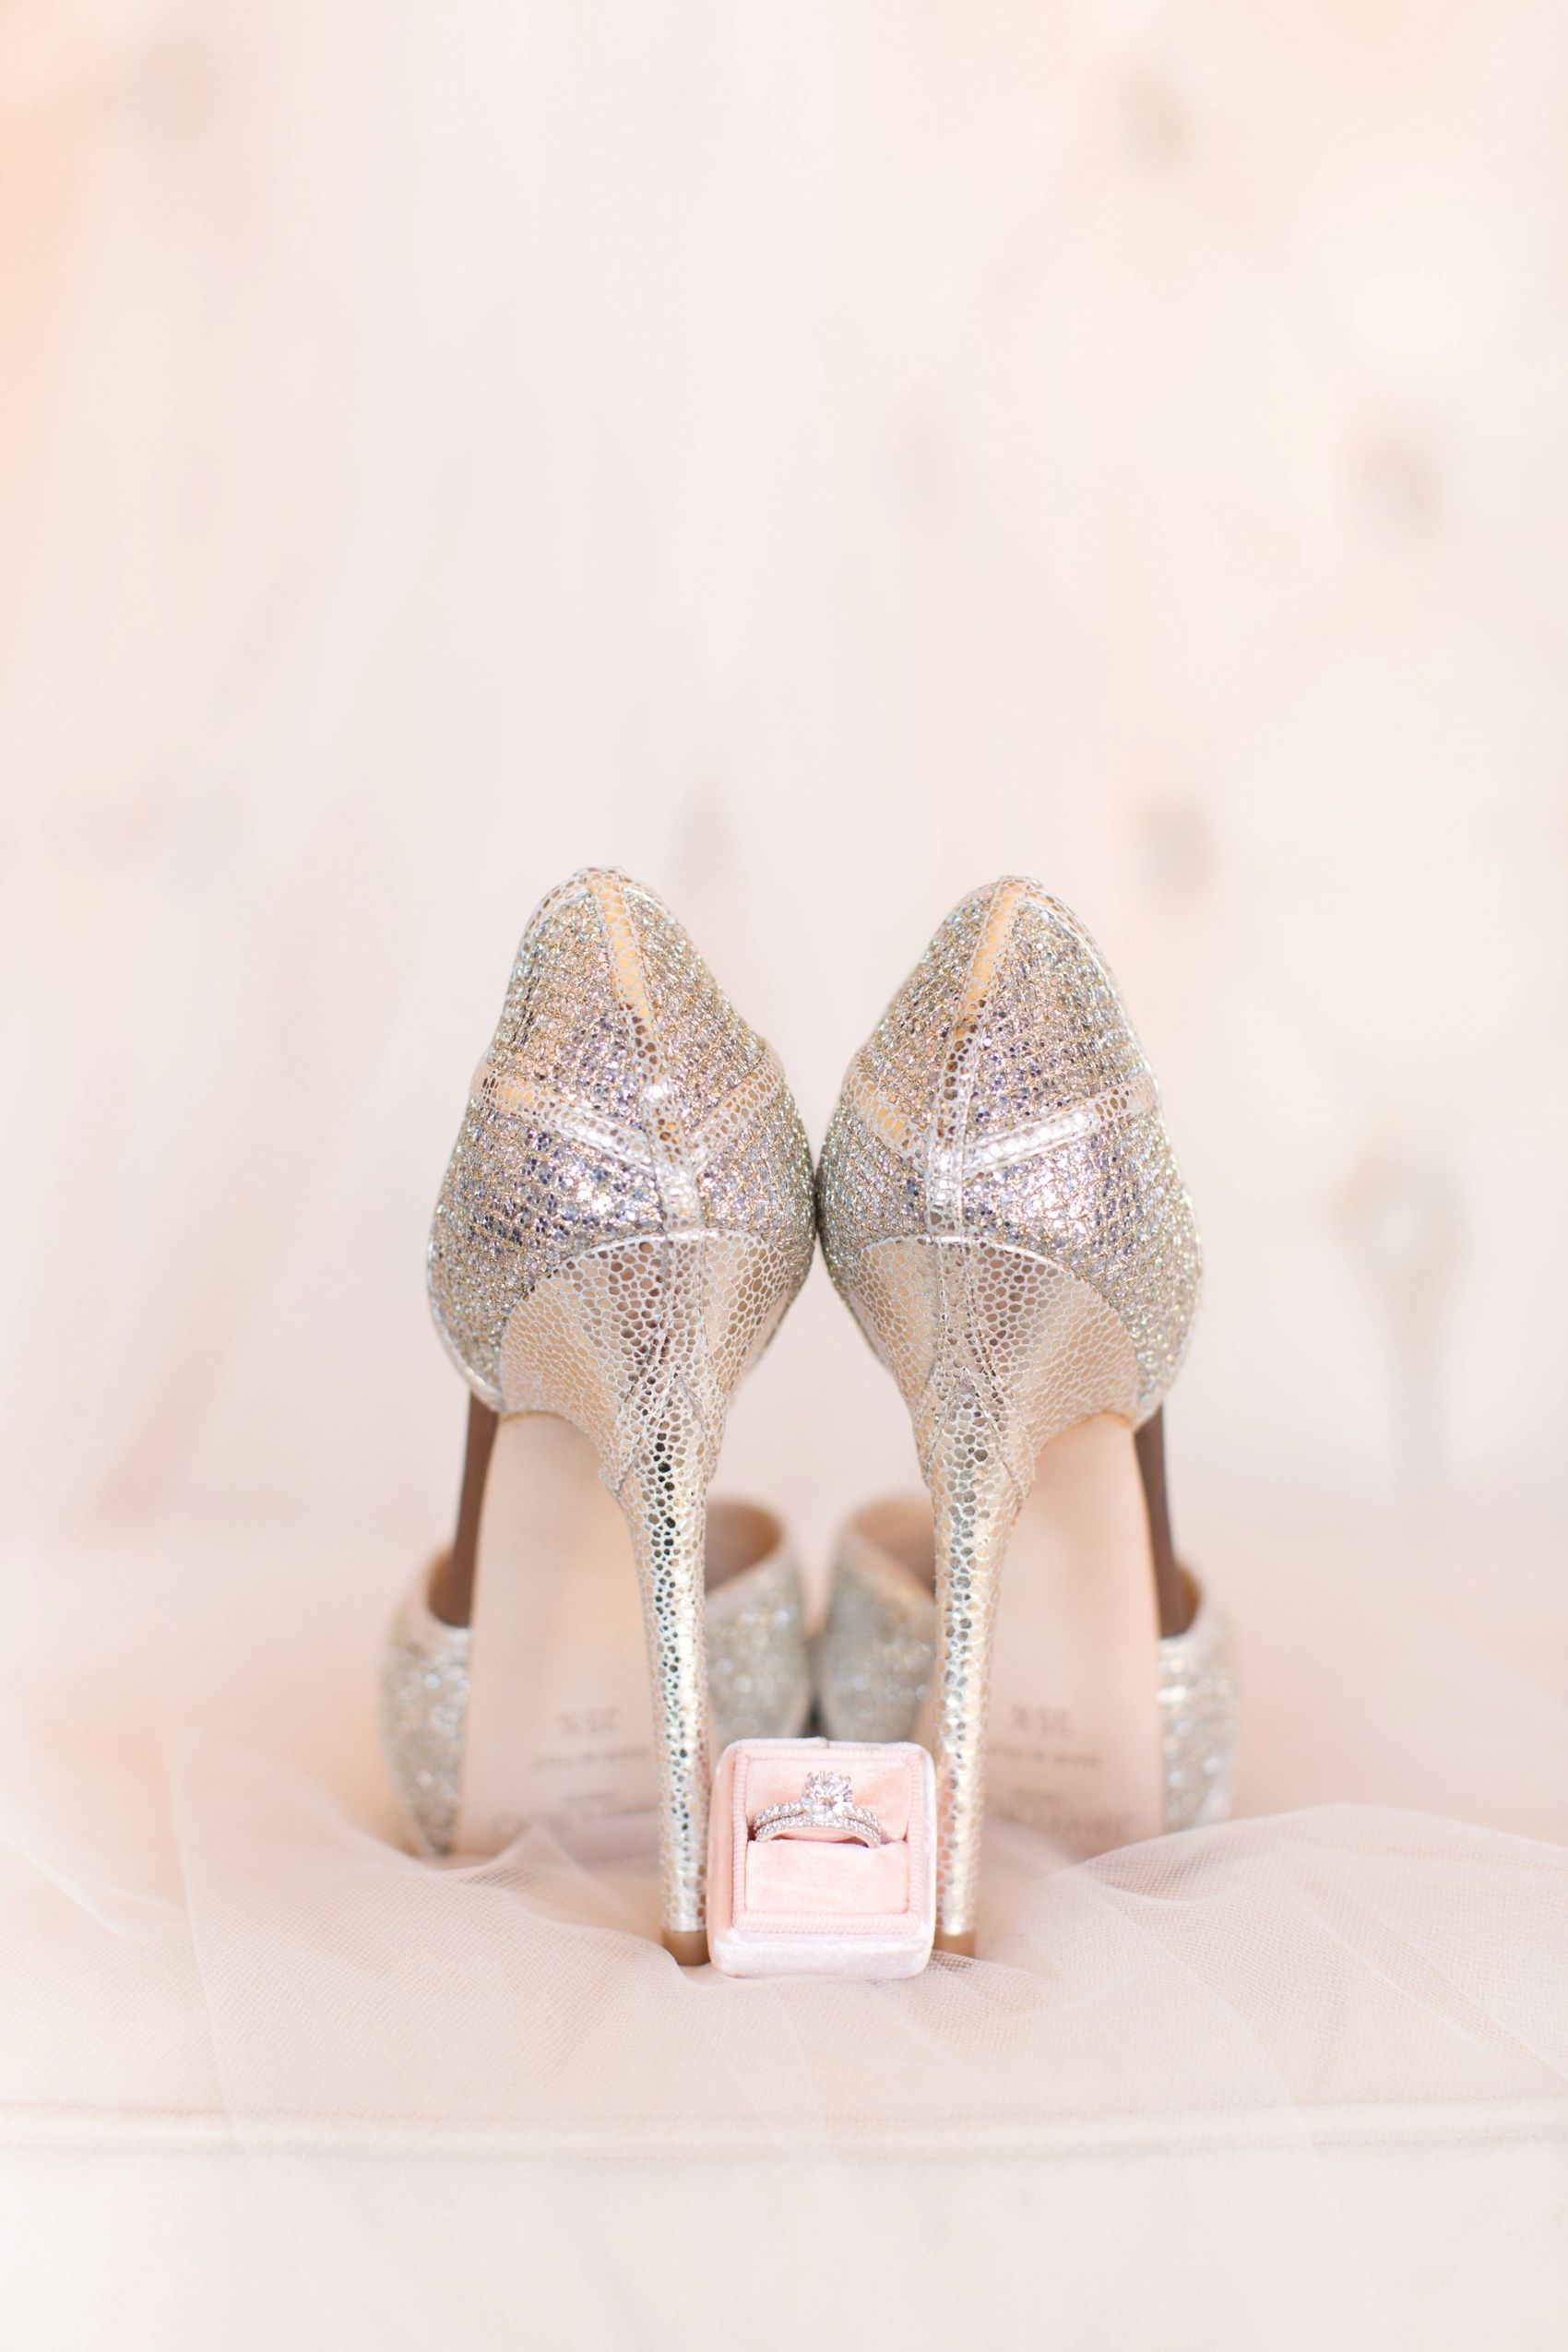 Black Tie Omni Montelucia Wedding In Scottsdale Arizona Bride